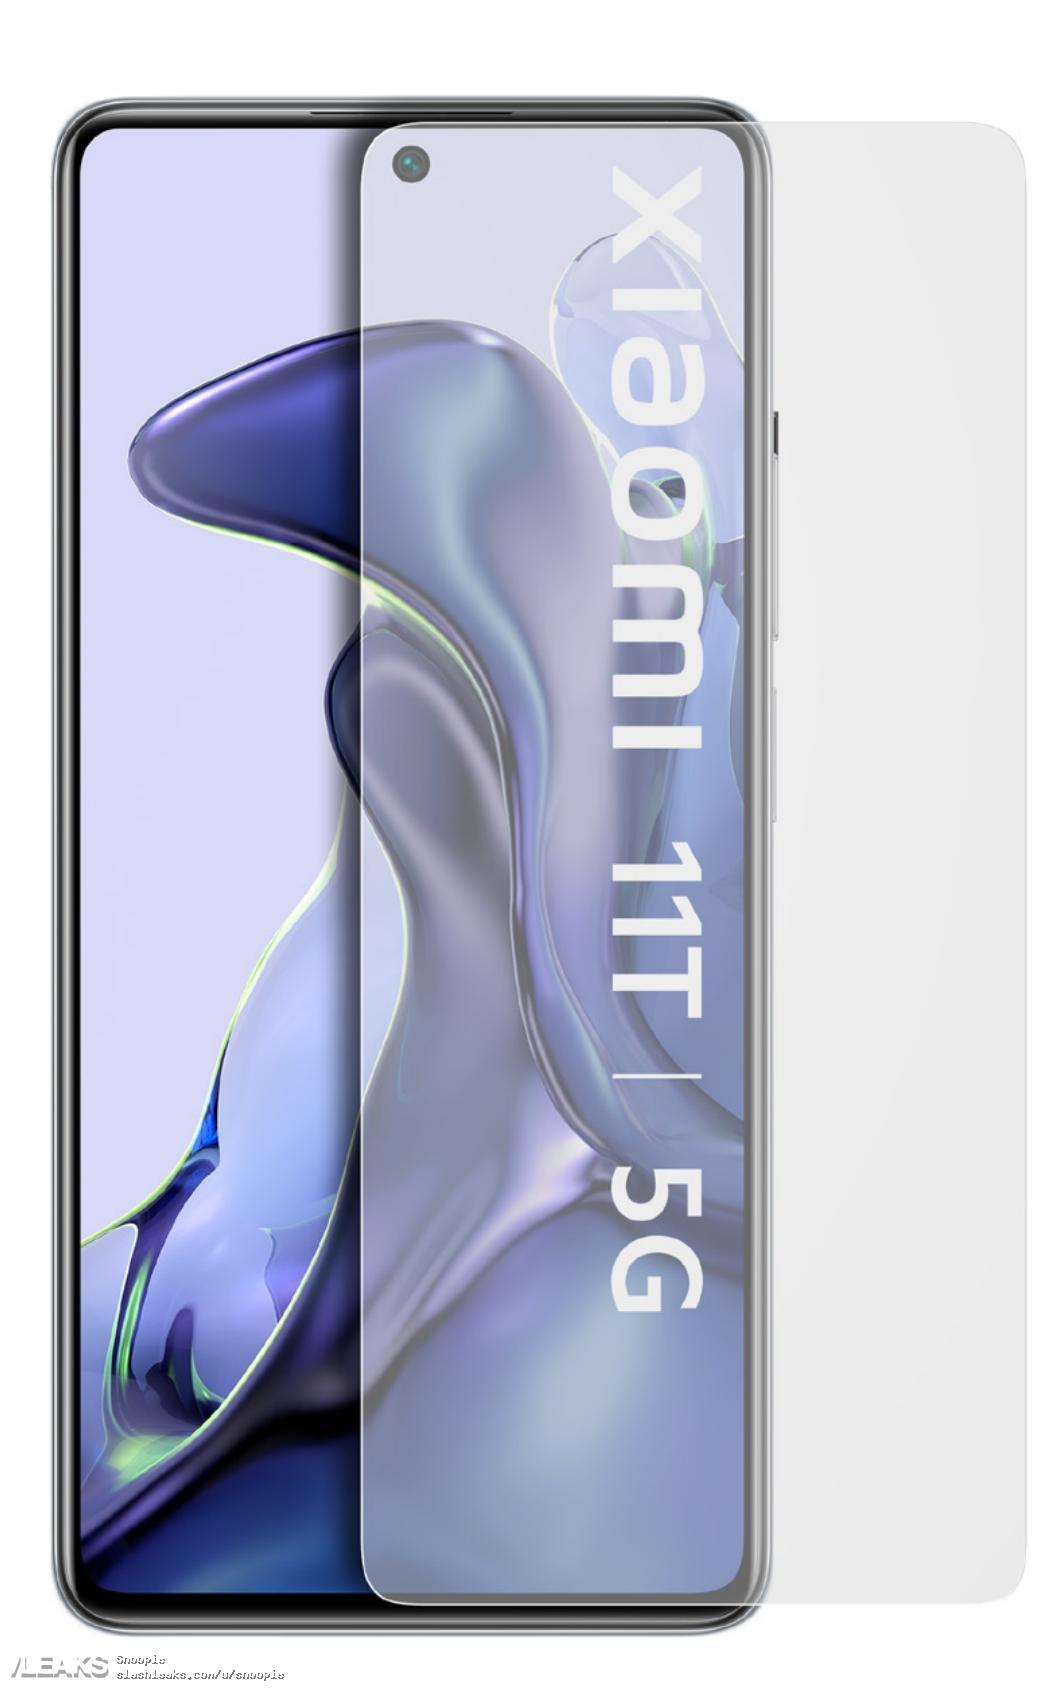 img Xiaomi 11T/Pro 5G Renders